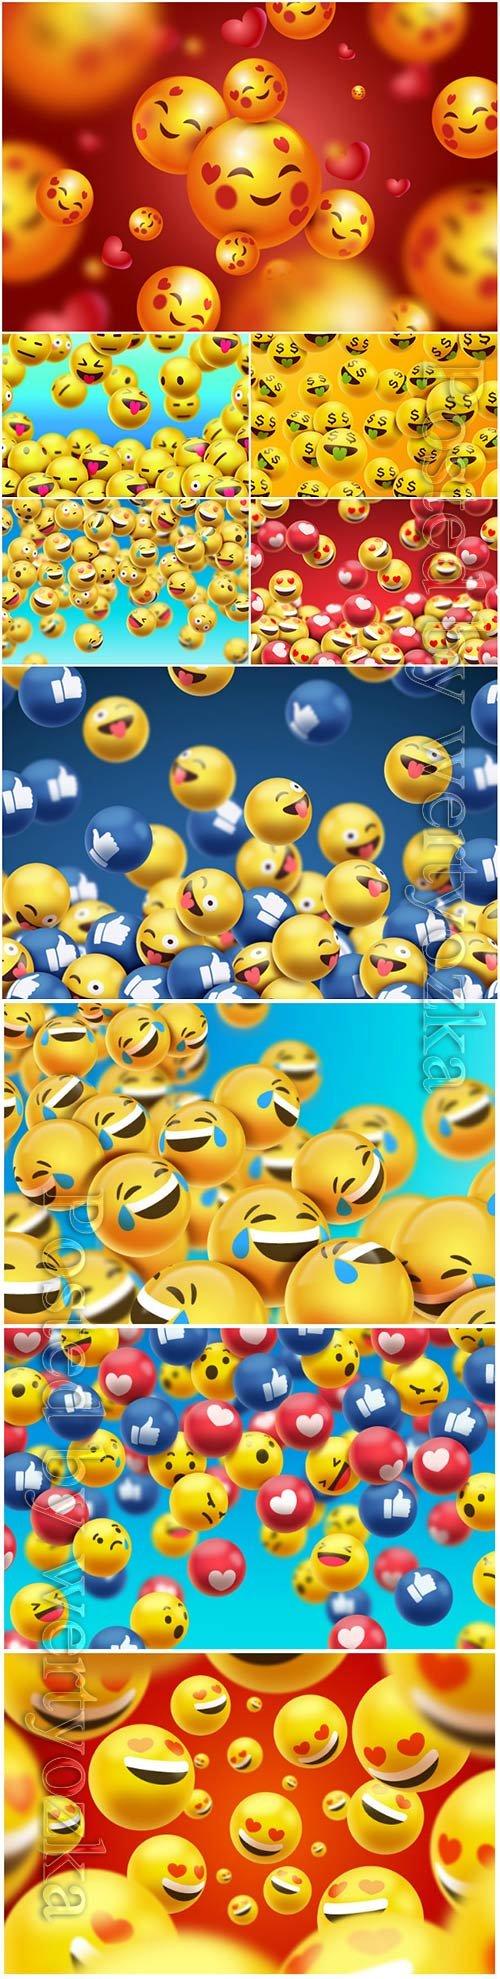 Emojis background realistic vector design